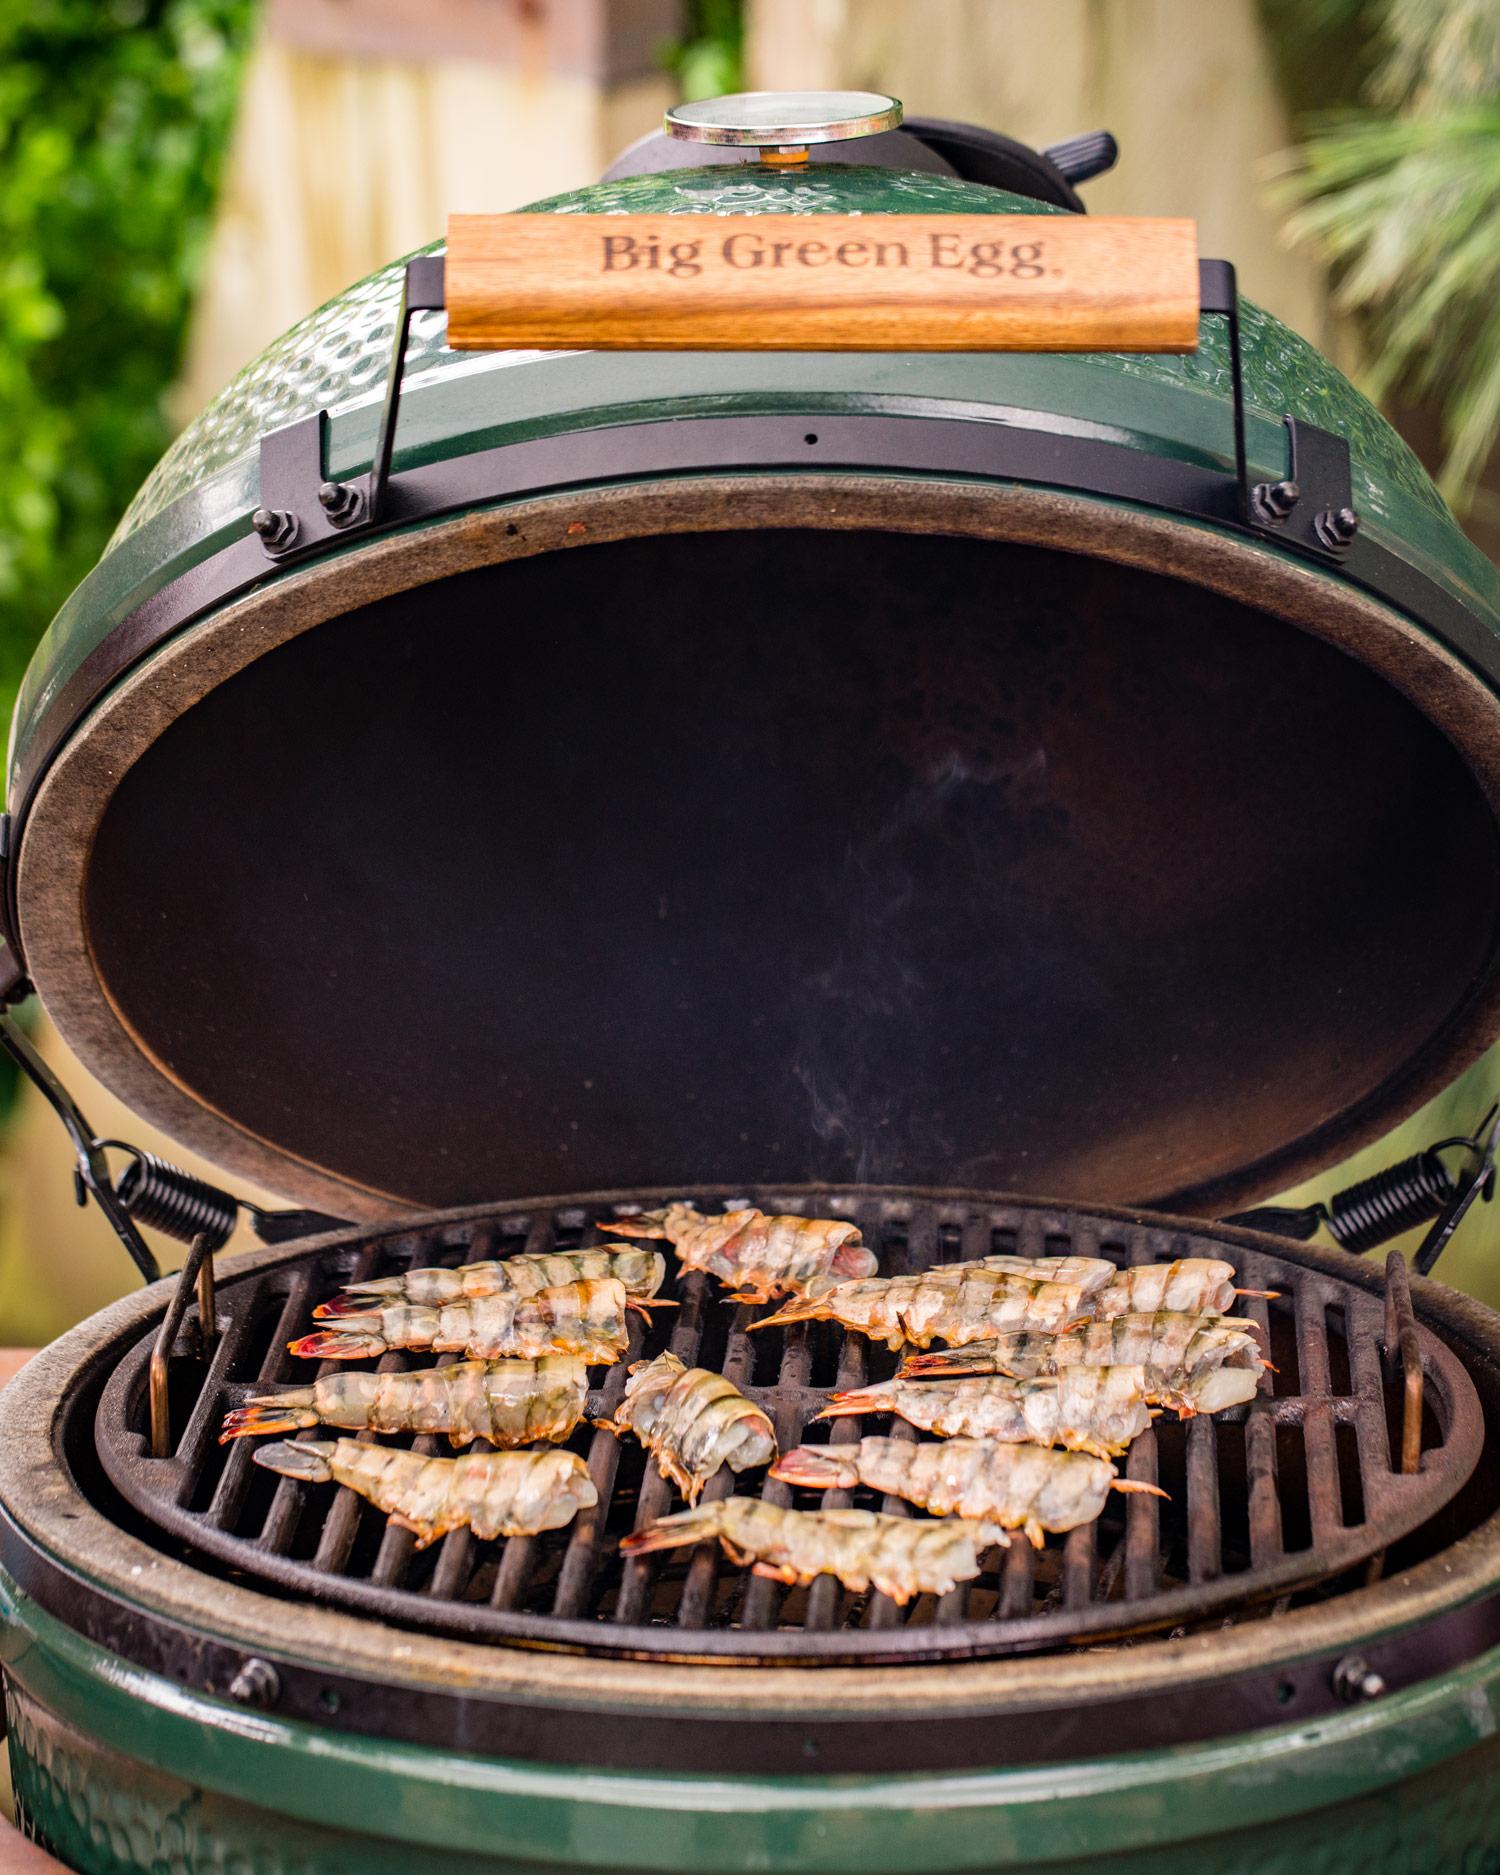 grill the prawns